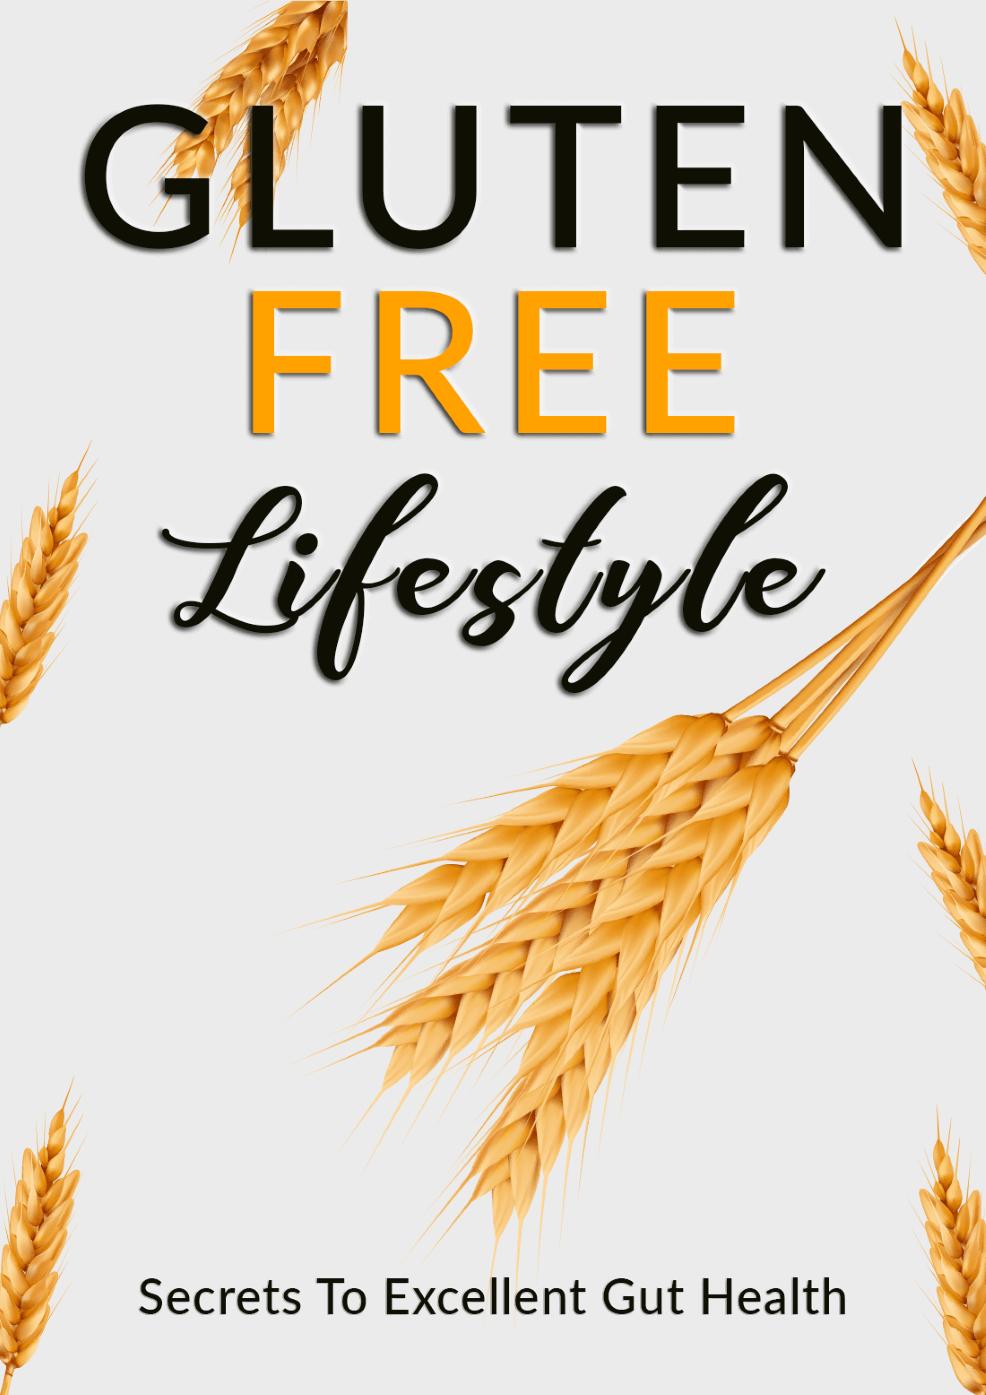 Gluten Free Lifestyle Video Course